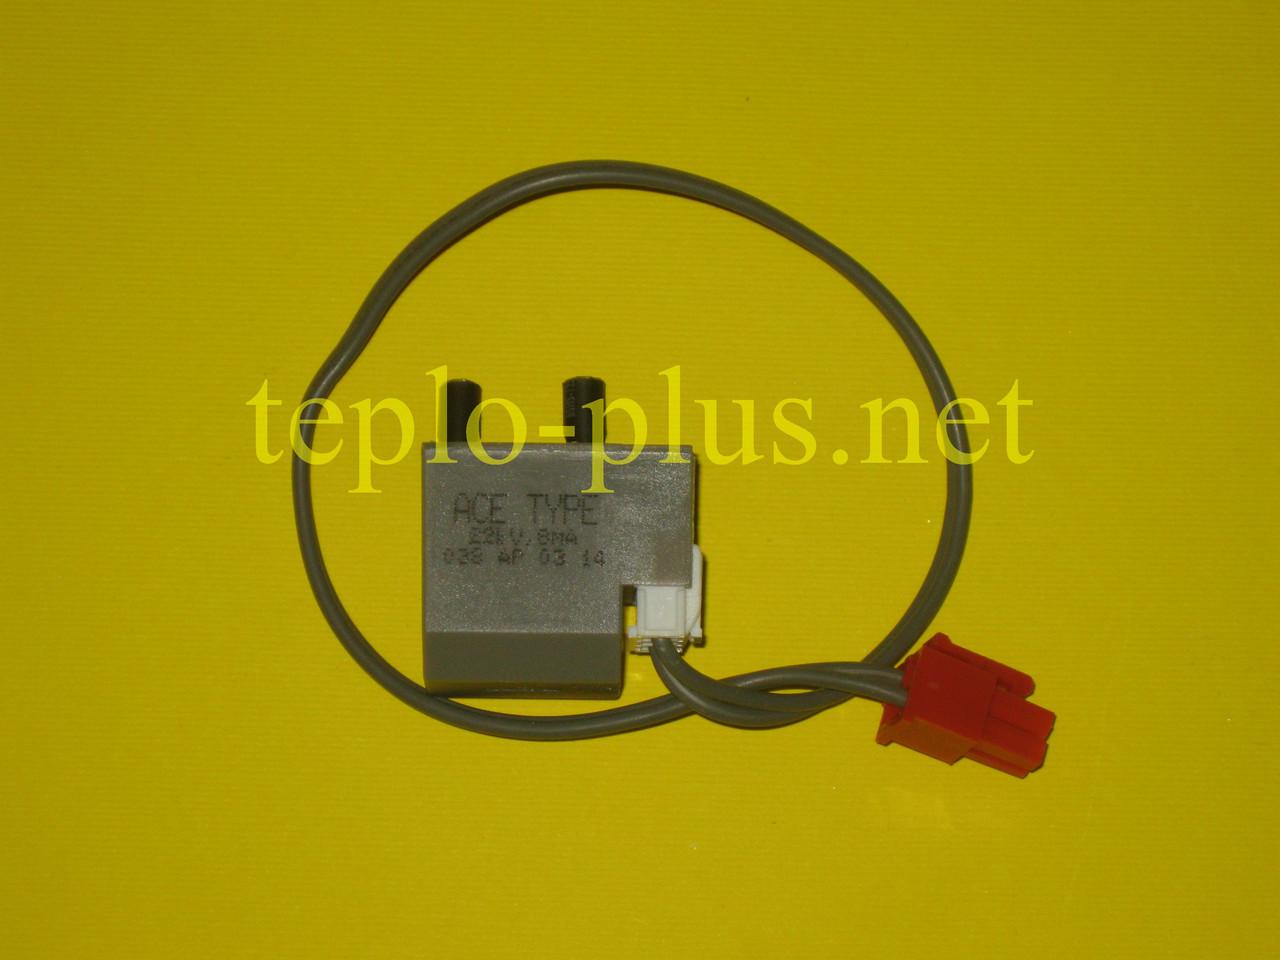 Трансформатор розжига BH1201043C (BH1201022A) Navien Ace ATMO 13-24kw, TURBO 10-40kw, TURBO Coaxial 10-30kw